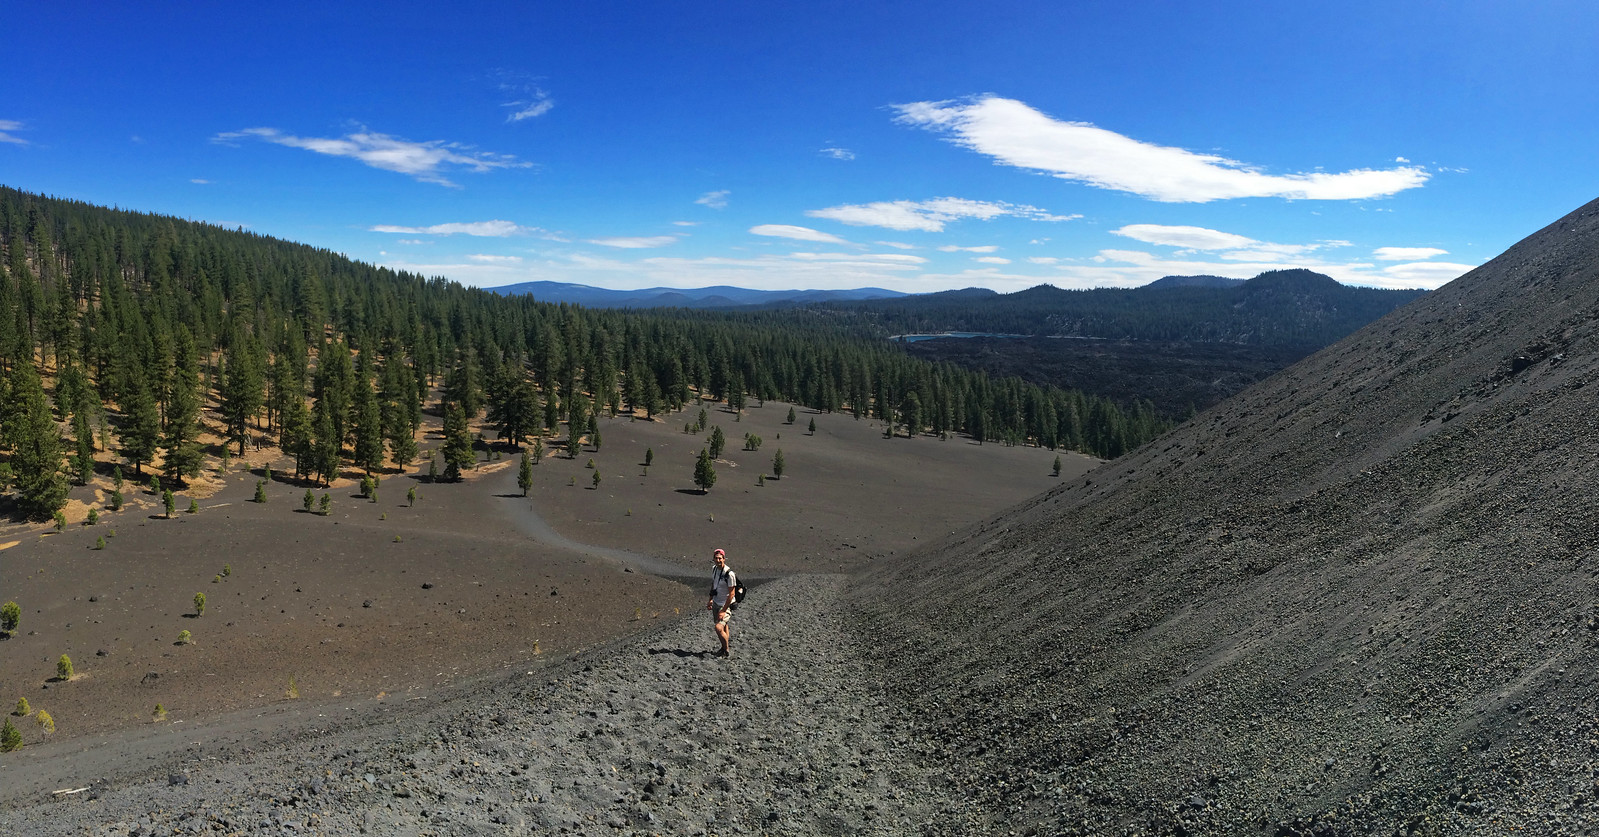 Lassen Volcanic National Park, California, USA